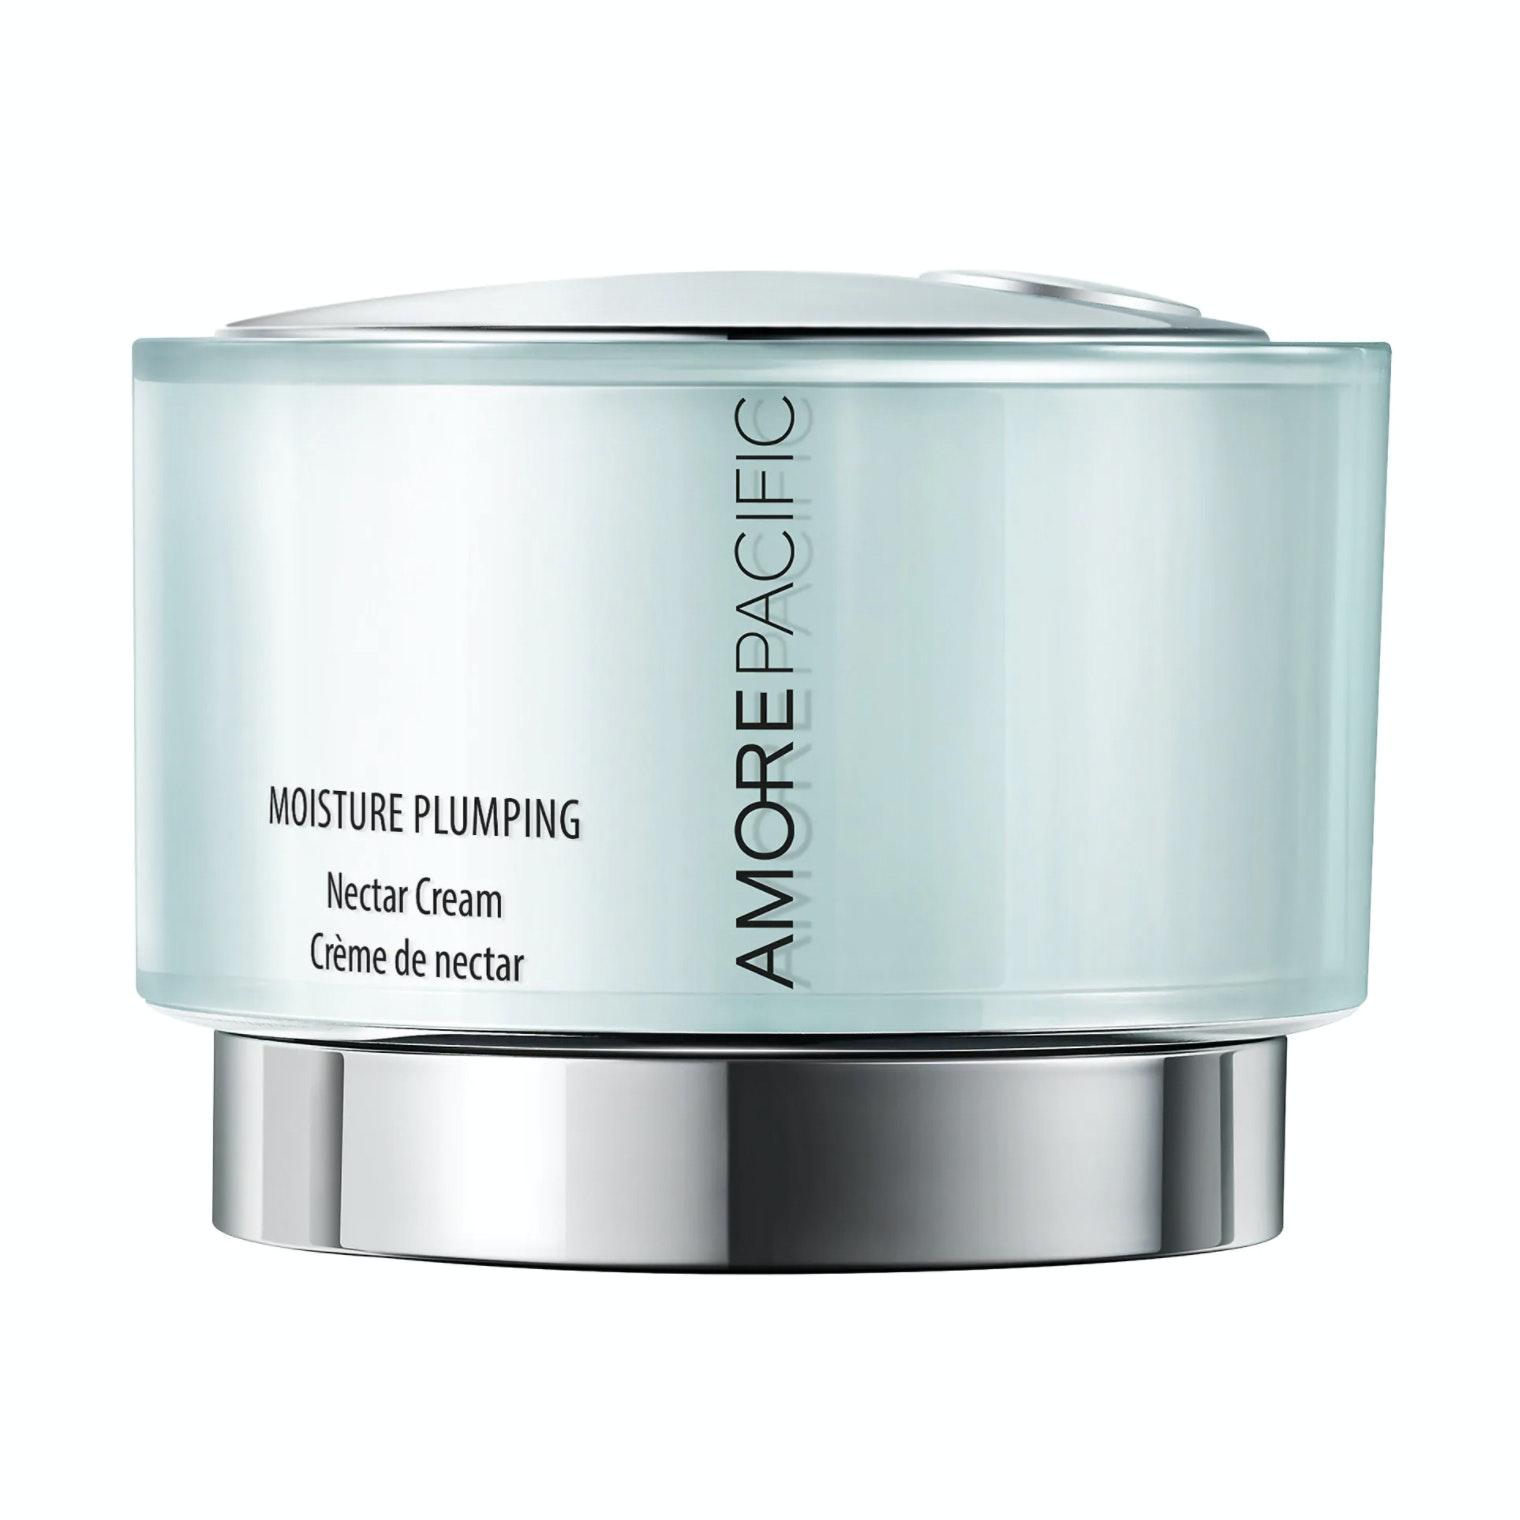 Amorepacific® Moisture Plumping Nectar Cream